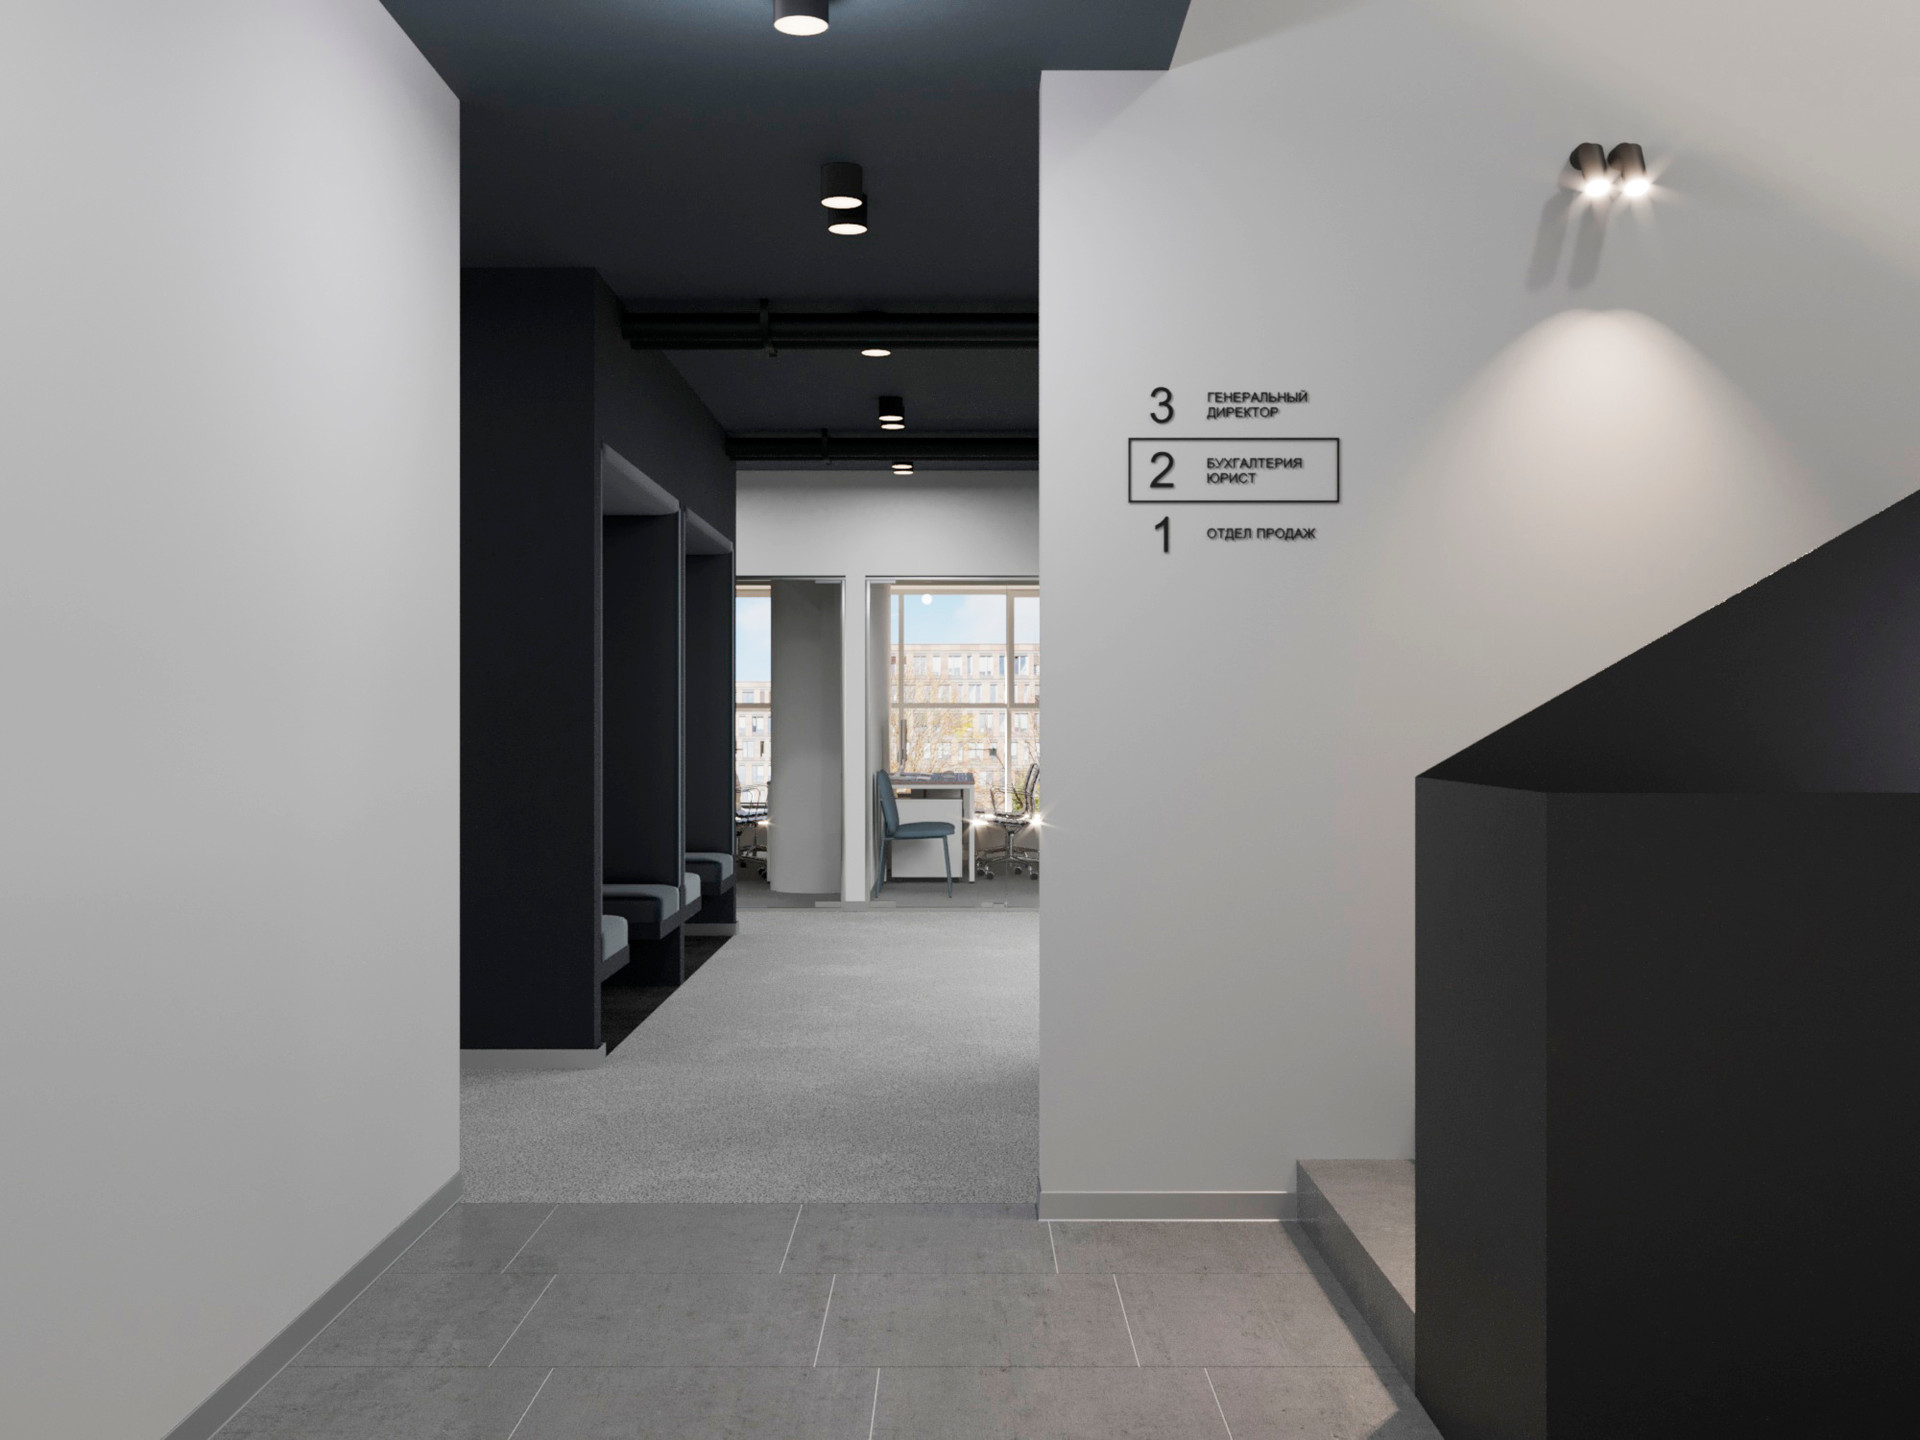 Офис 2 этаж0024.jpg